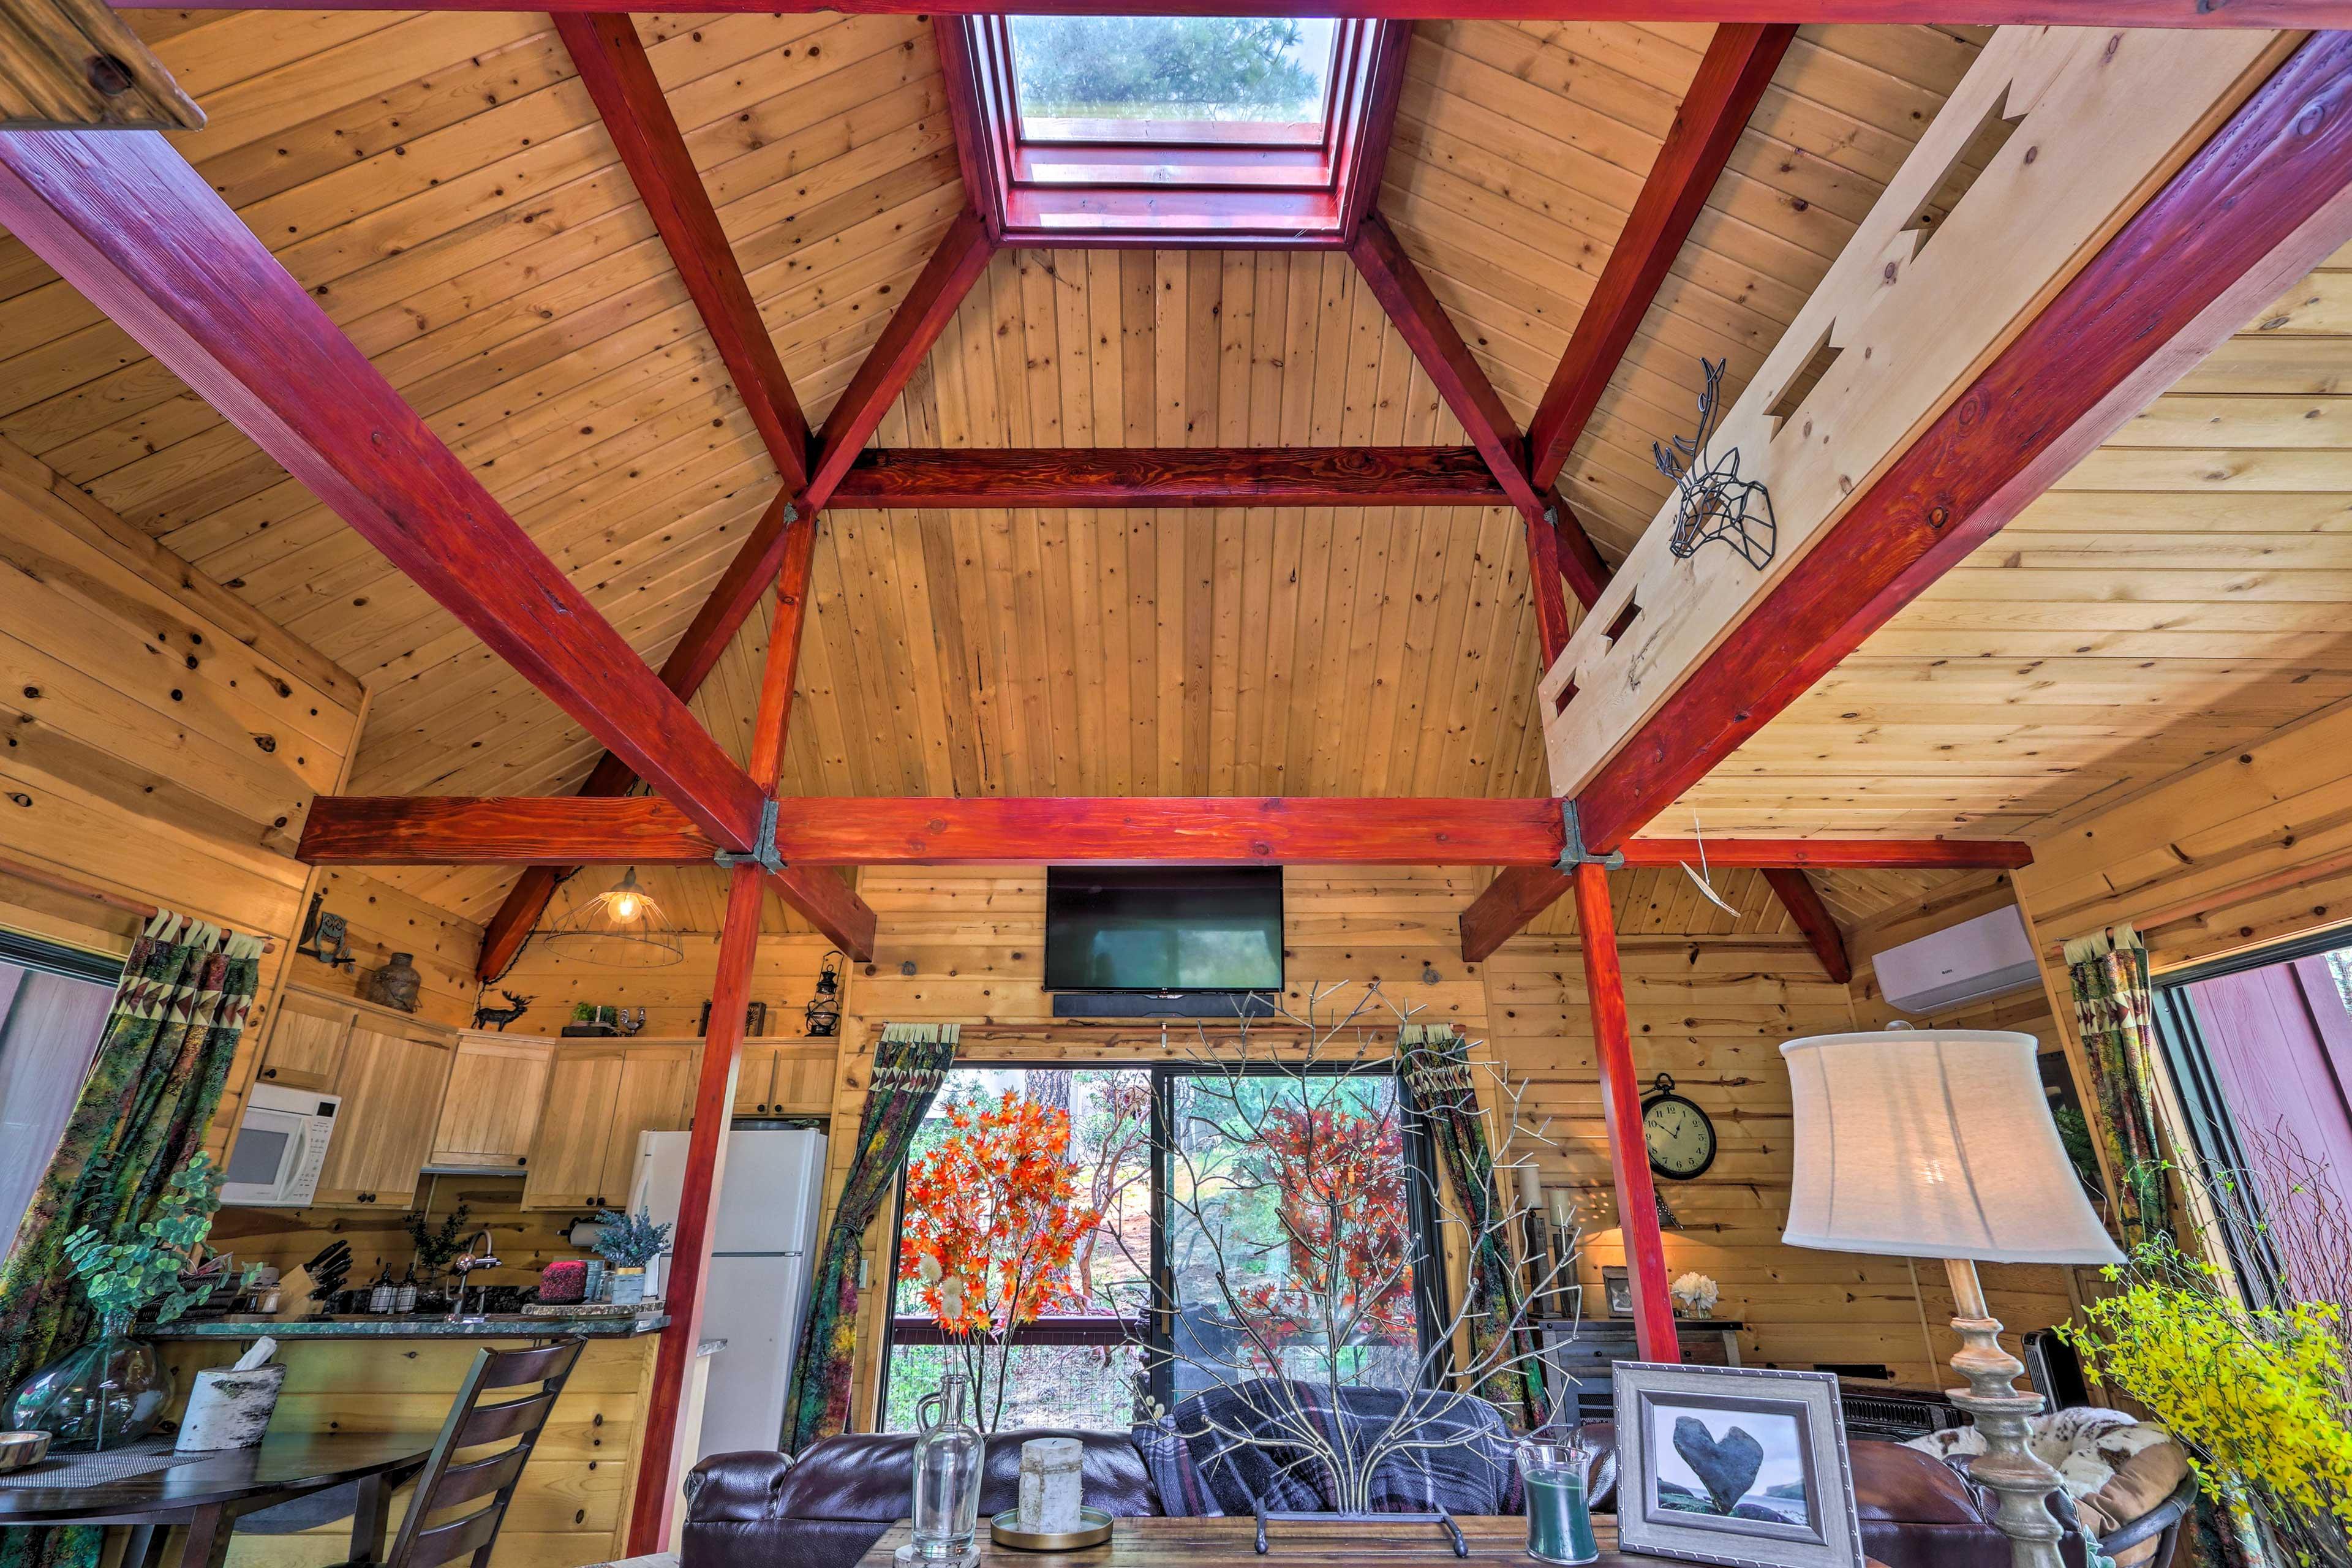 Living Room / Skylight / Natural Lighting / Breeze